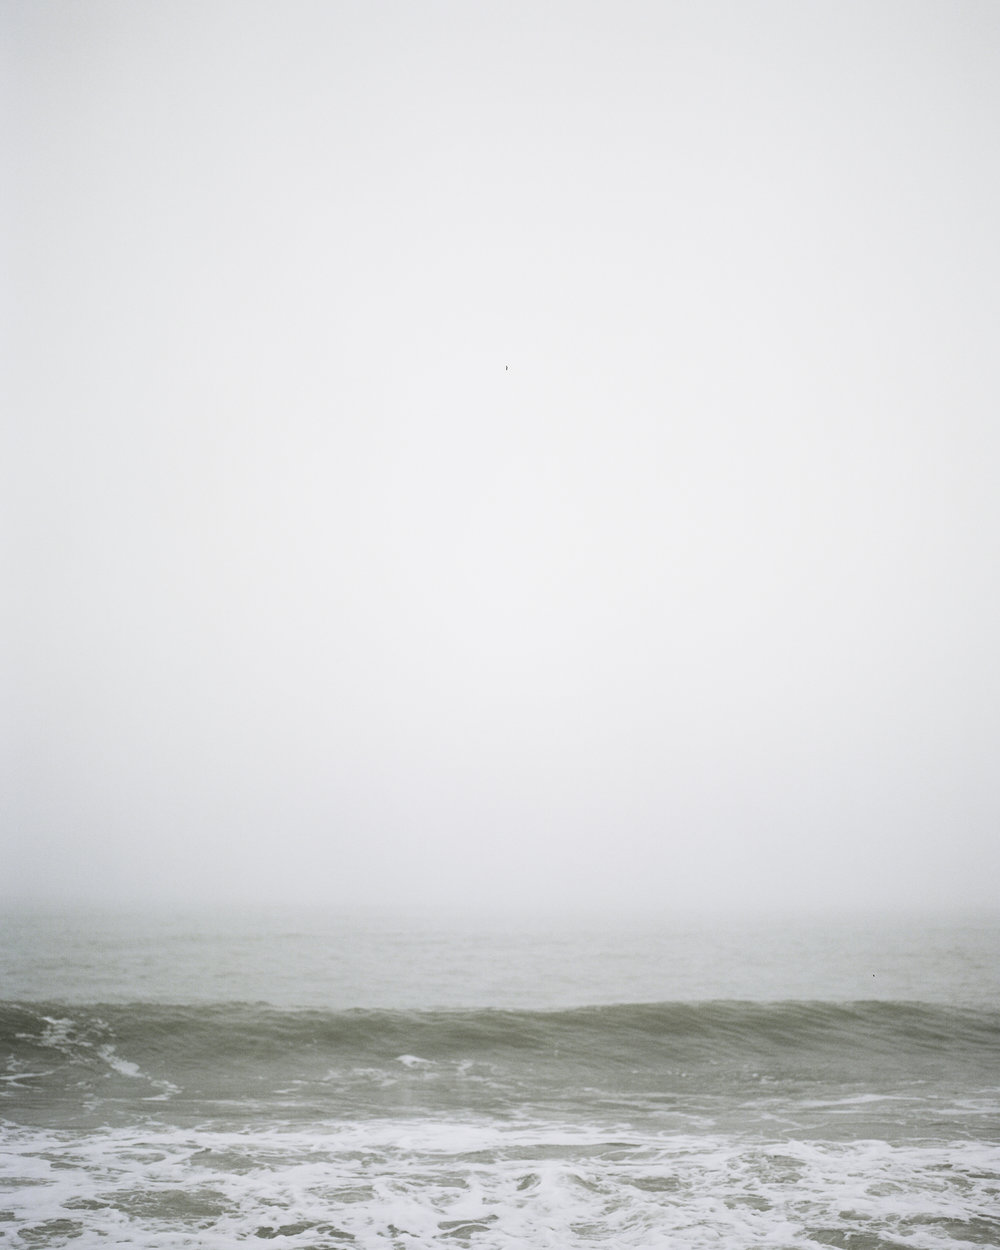 Sand and Surf-16.jpg